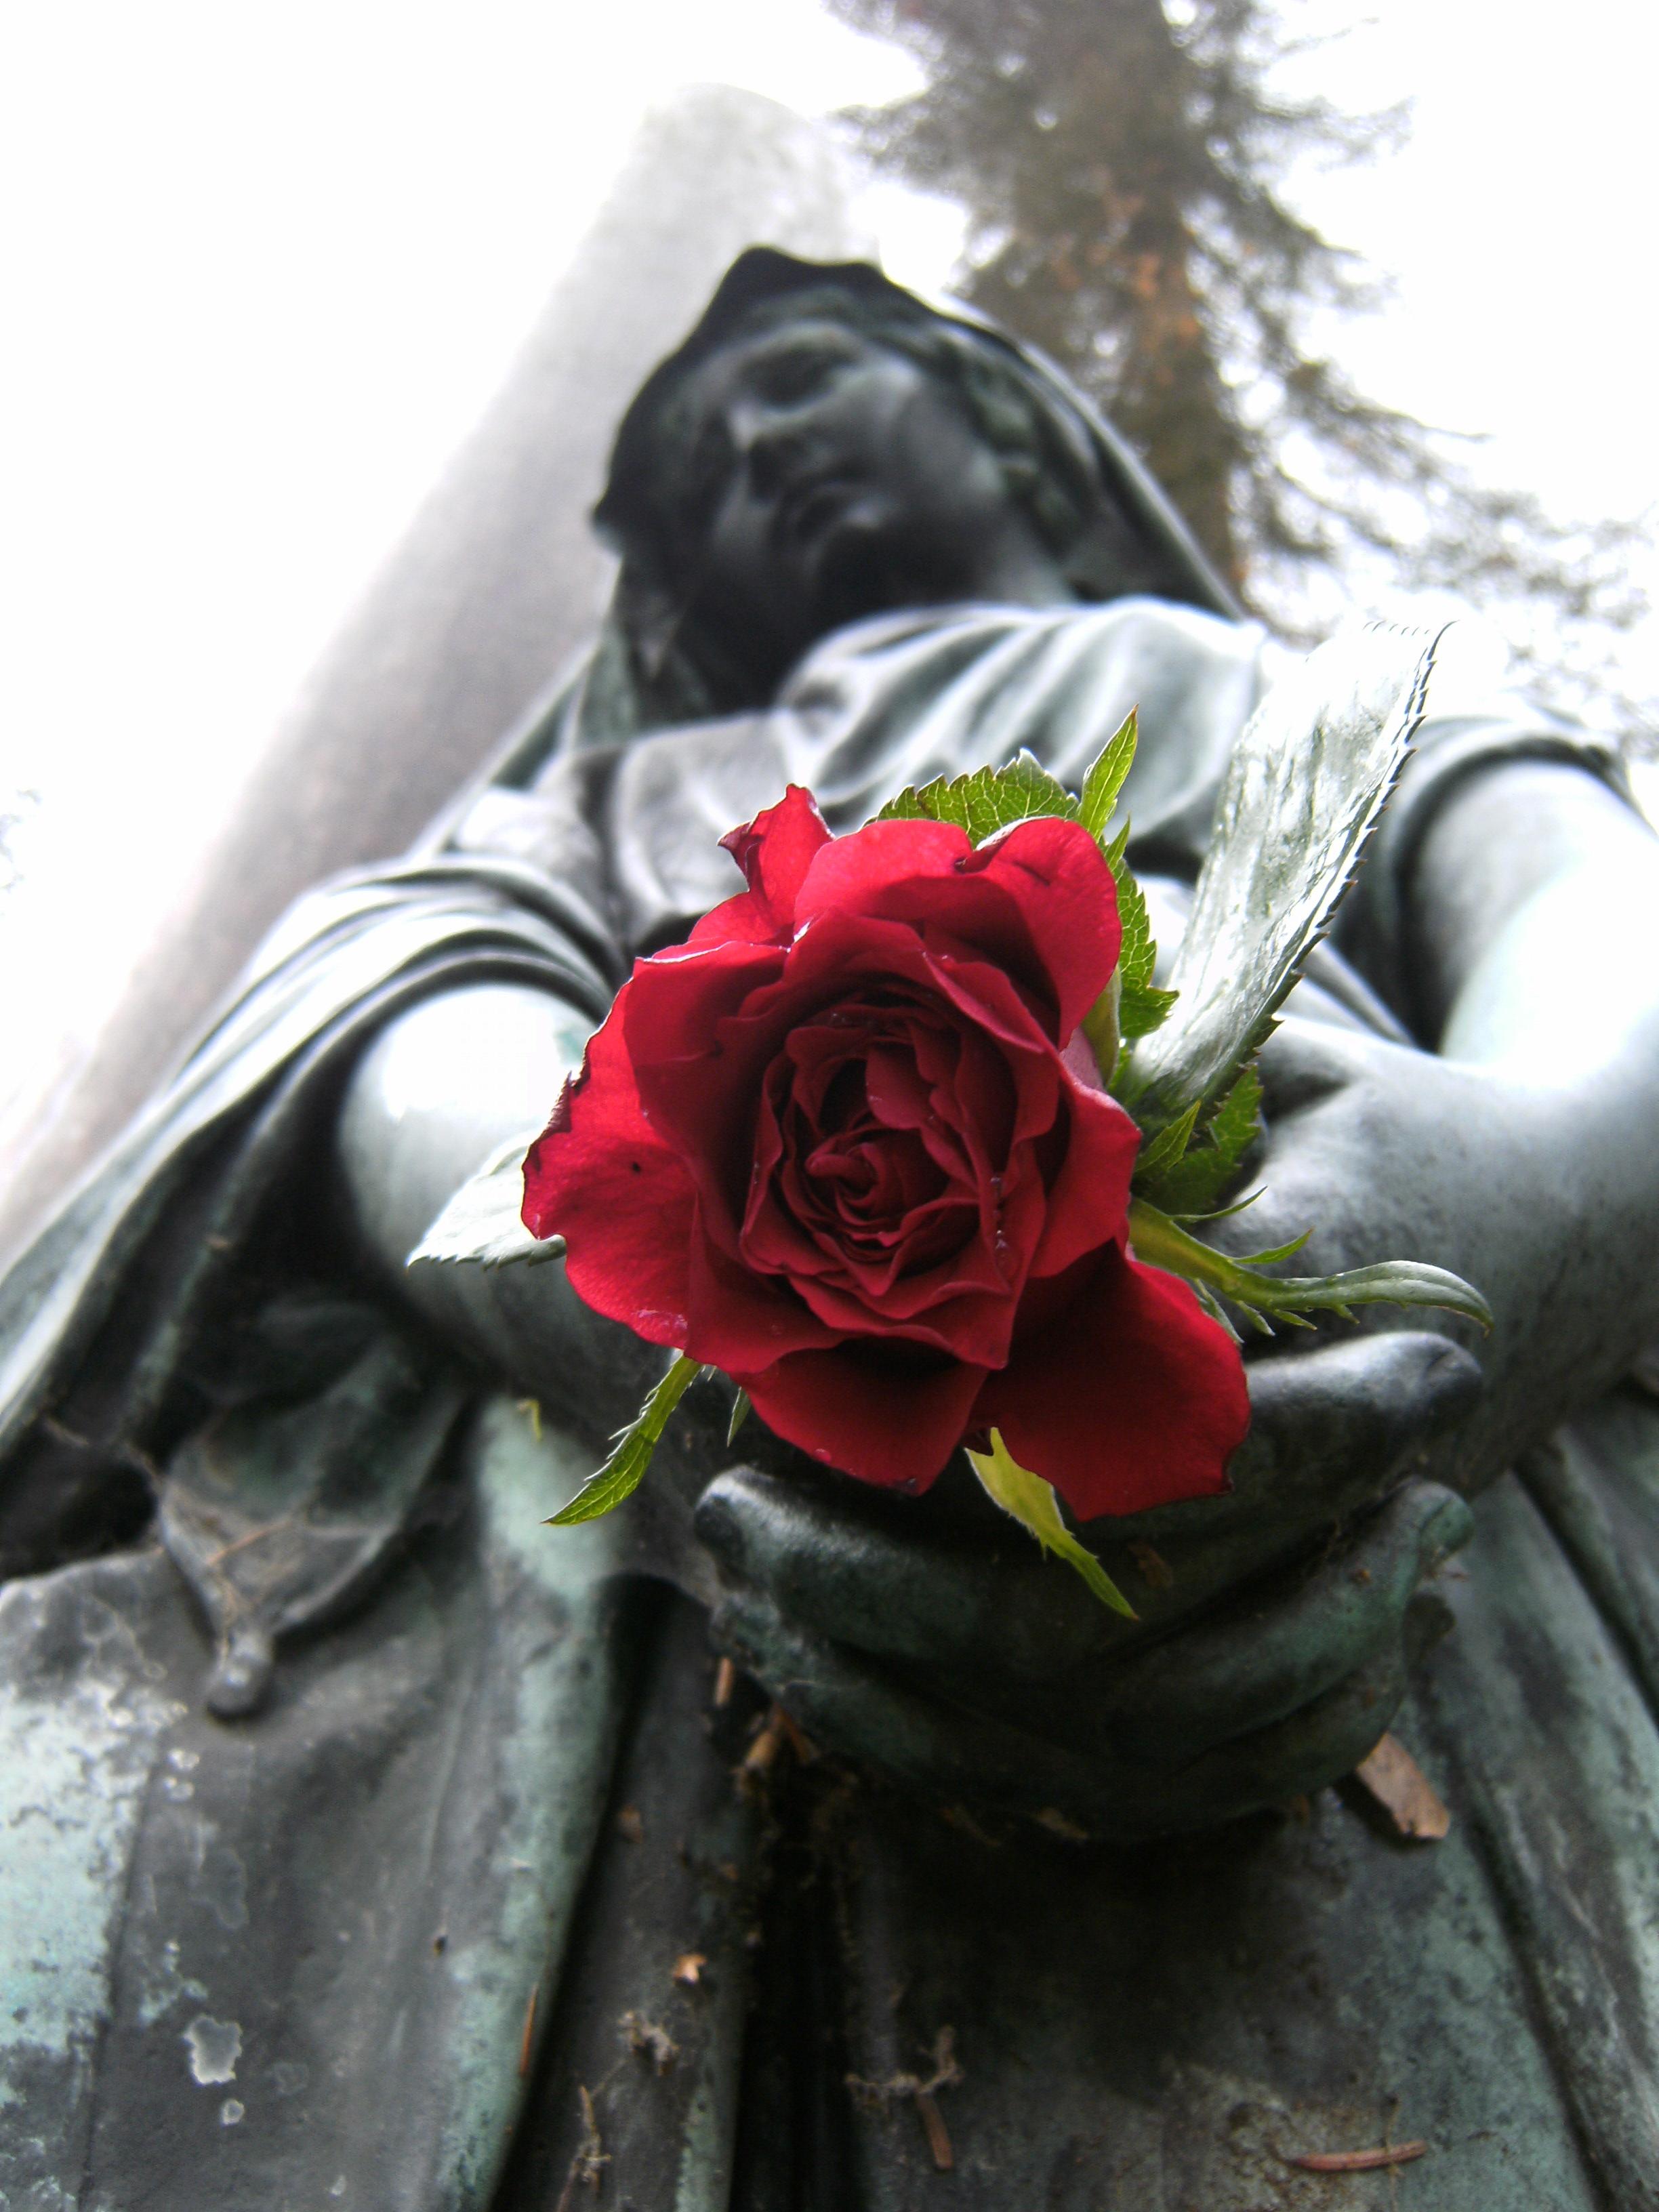 File:Rote Rose und Engel - panoramio.jpg - Wikimedia Commons